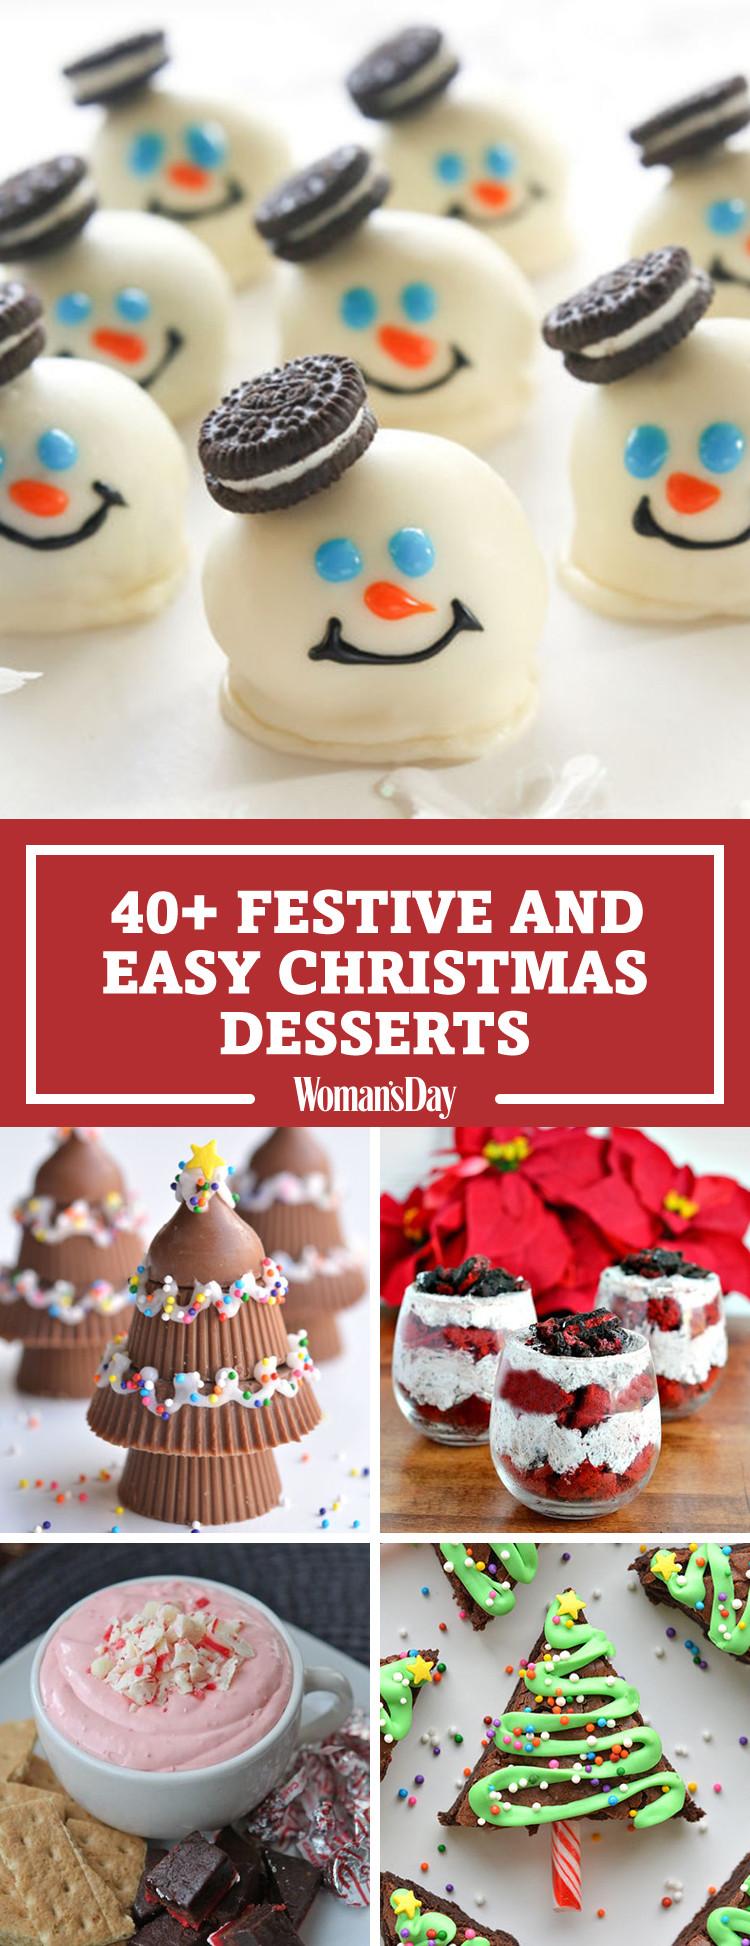 Best Easy Christmas Desserts  57 Easy Christmas Dessert Recipes Best Ideas for Fun